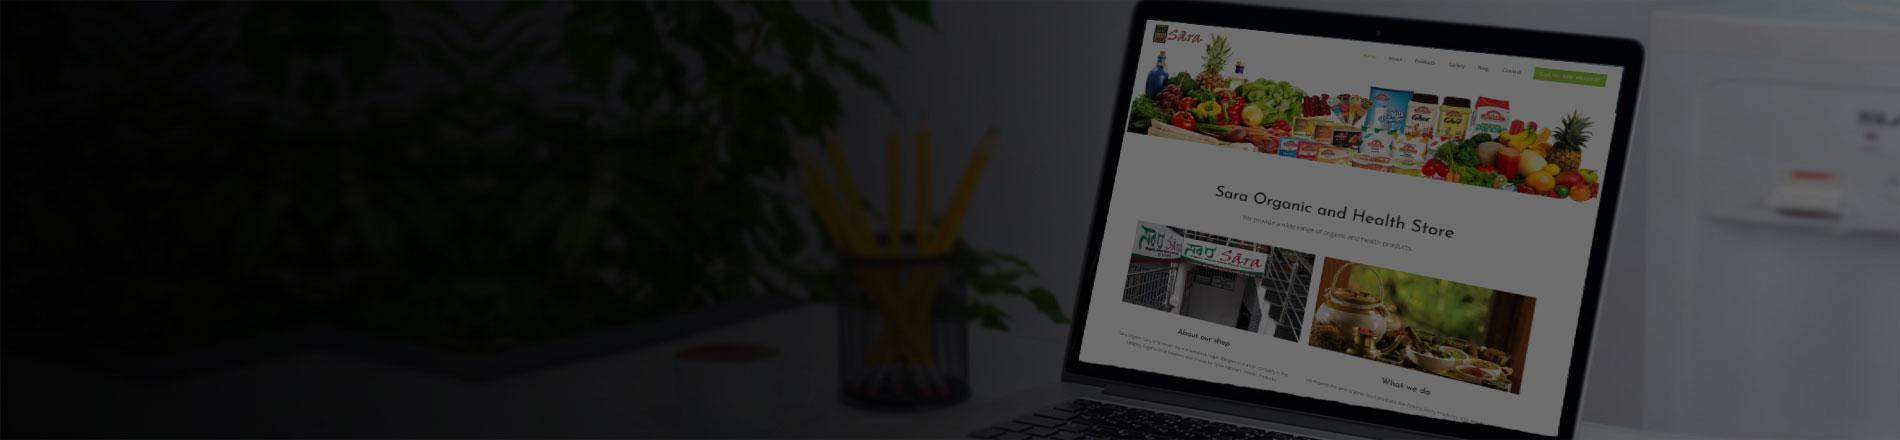 web-design-background